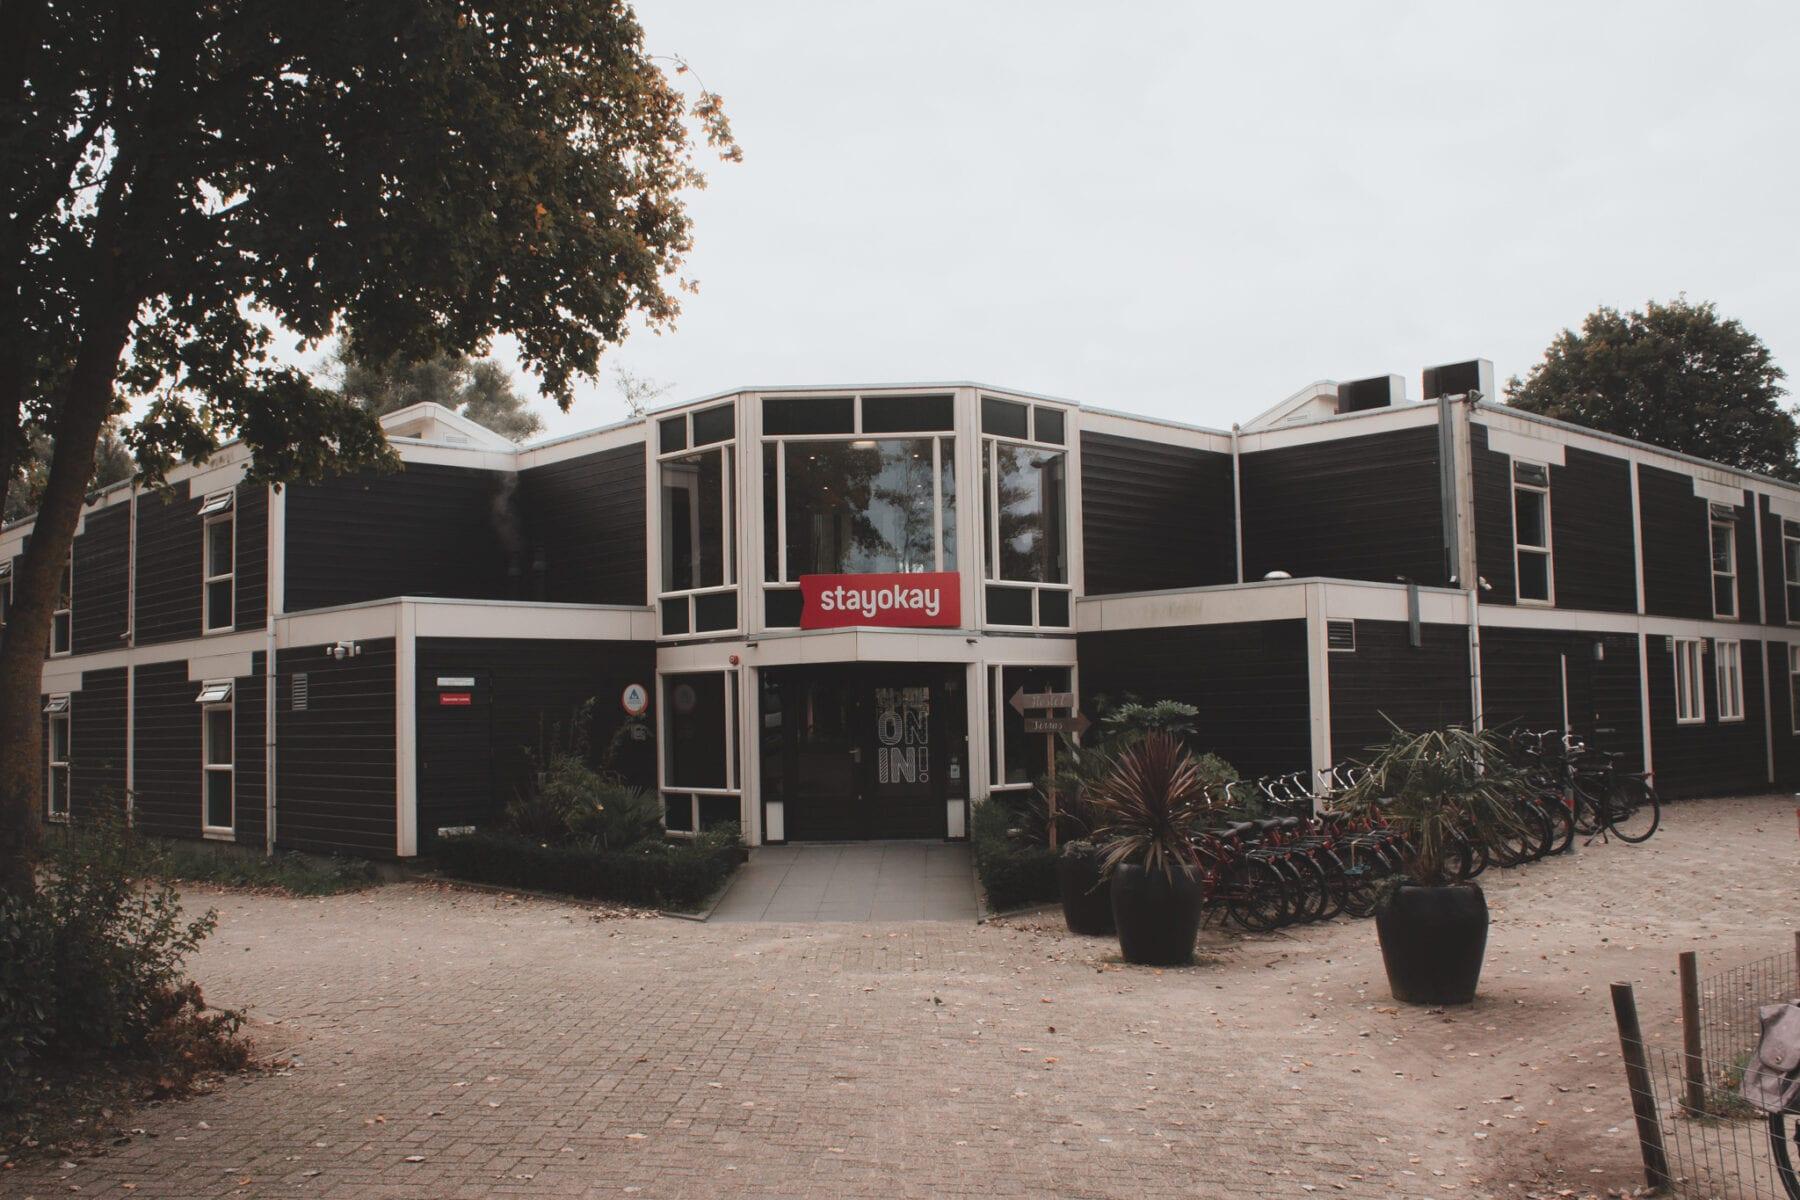 Biesbosch StayOkay Dordrecht